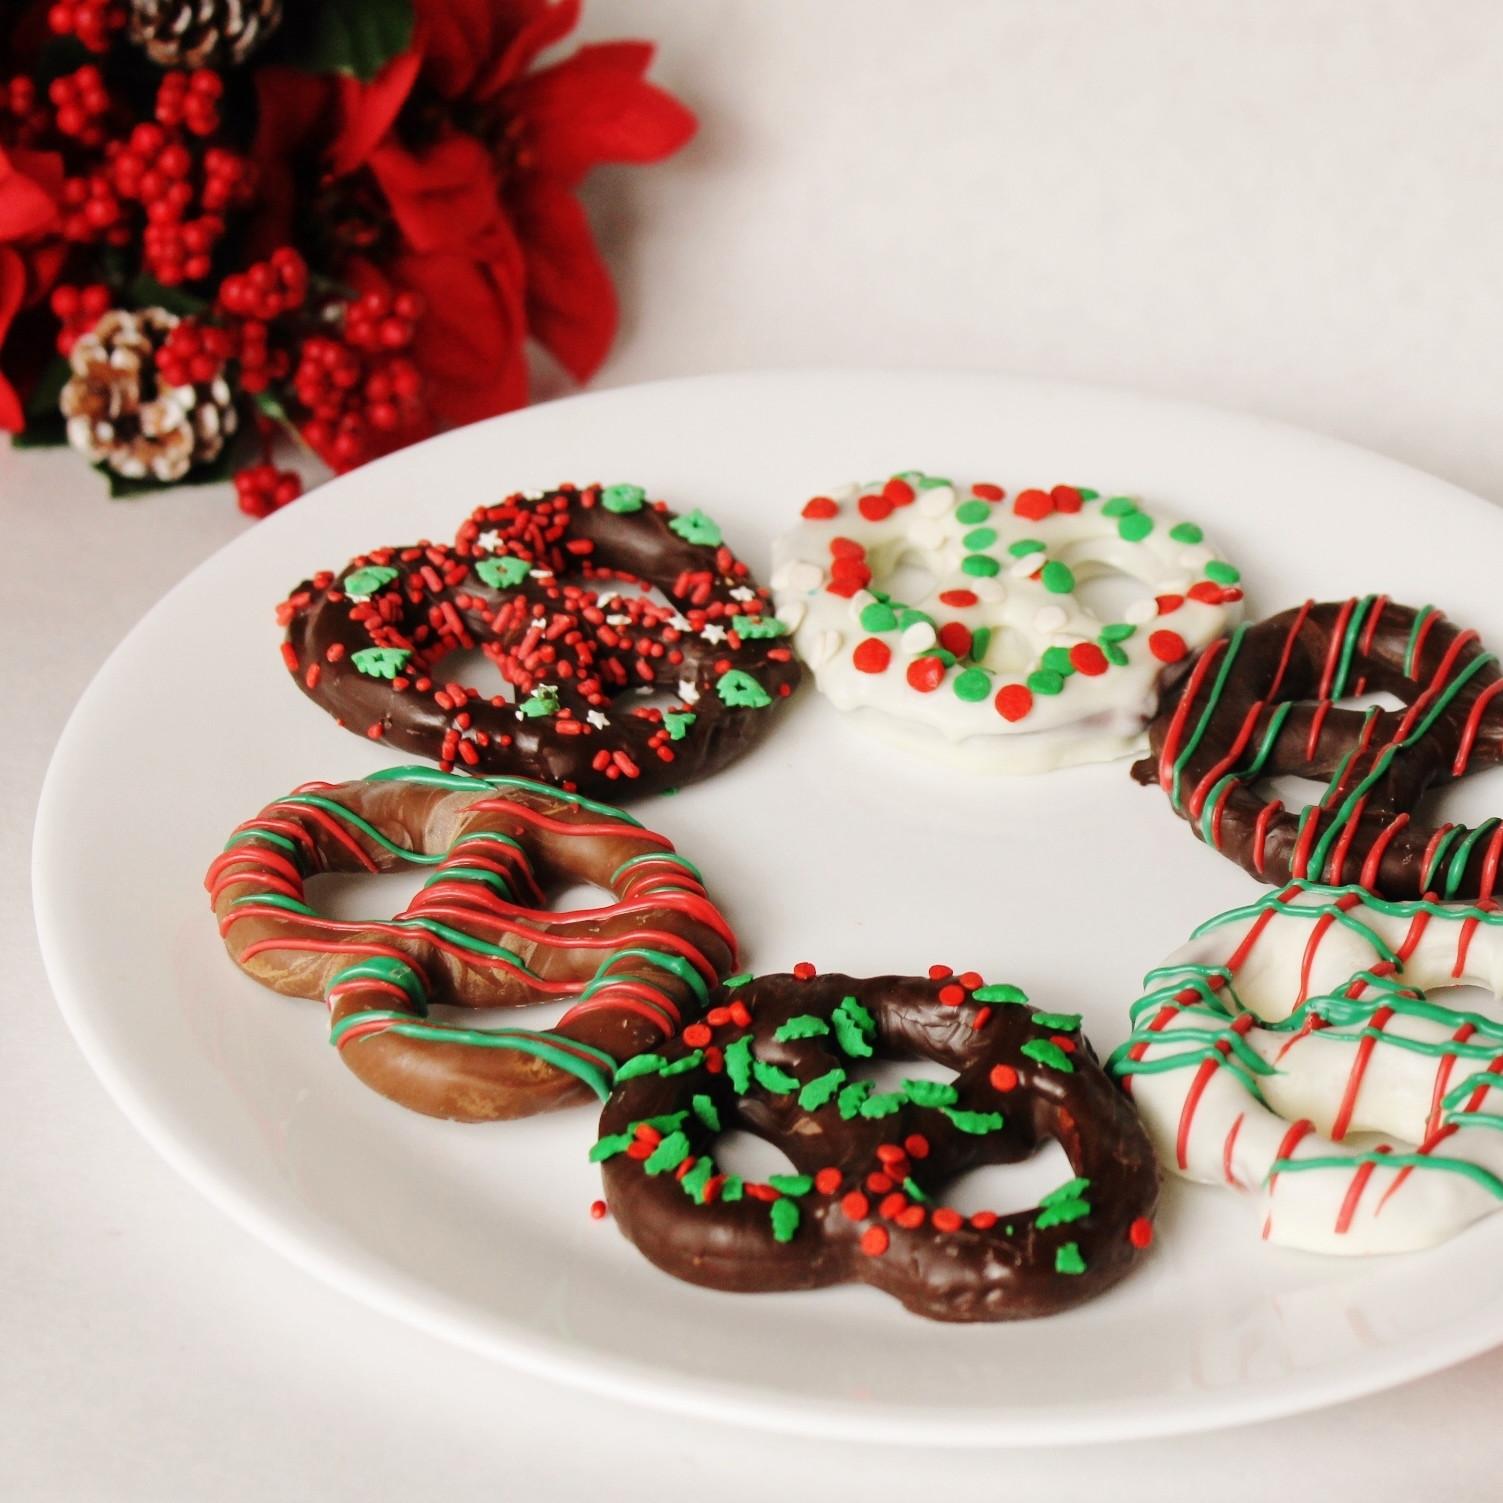 Christmas Chocolate Covered Pretzels  Christmas Chocolate Covered Pretzels Knots